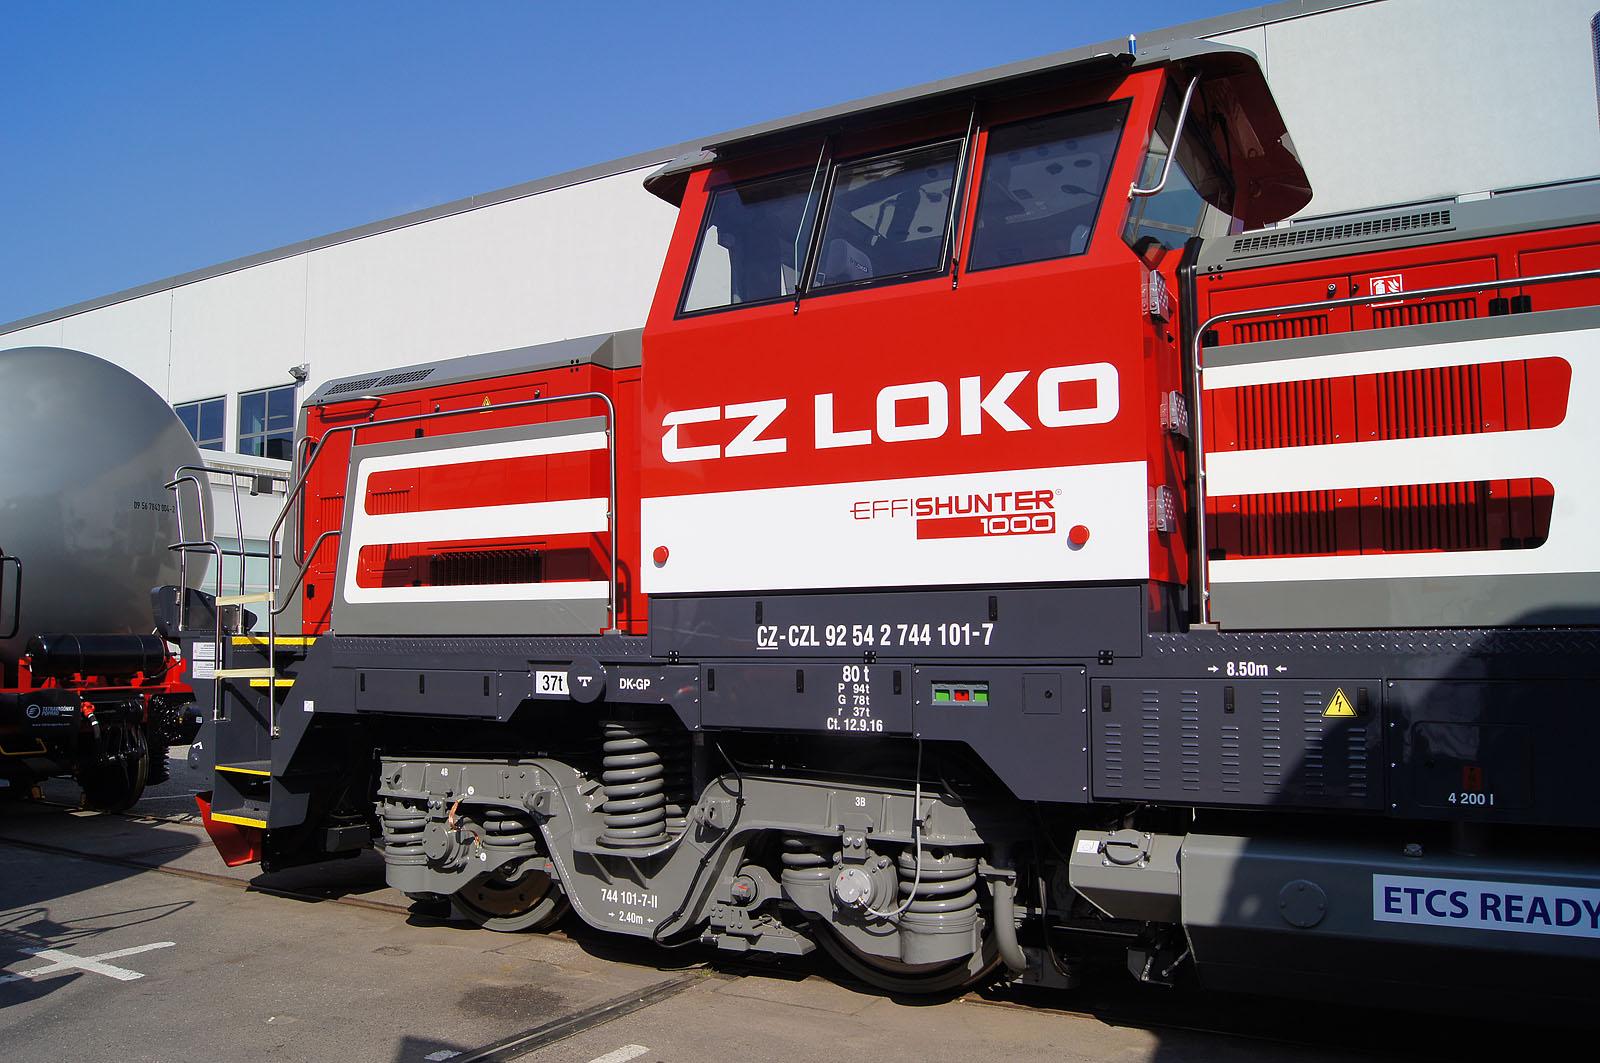 [CZ] CZ Loko: 744 101 'EffiShunter 1000' meets Stage IIIB emission standards